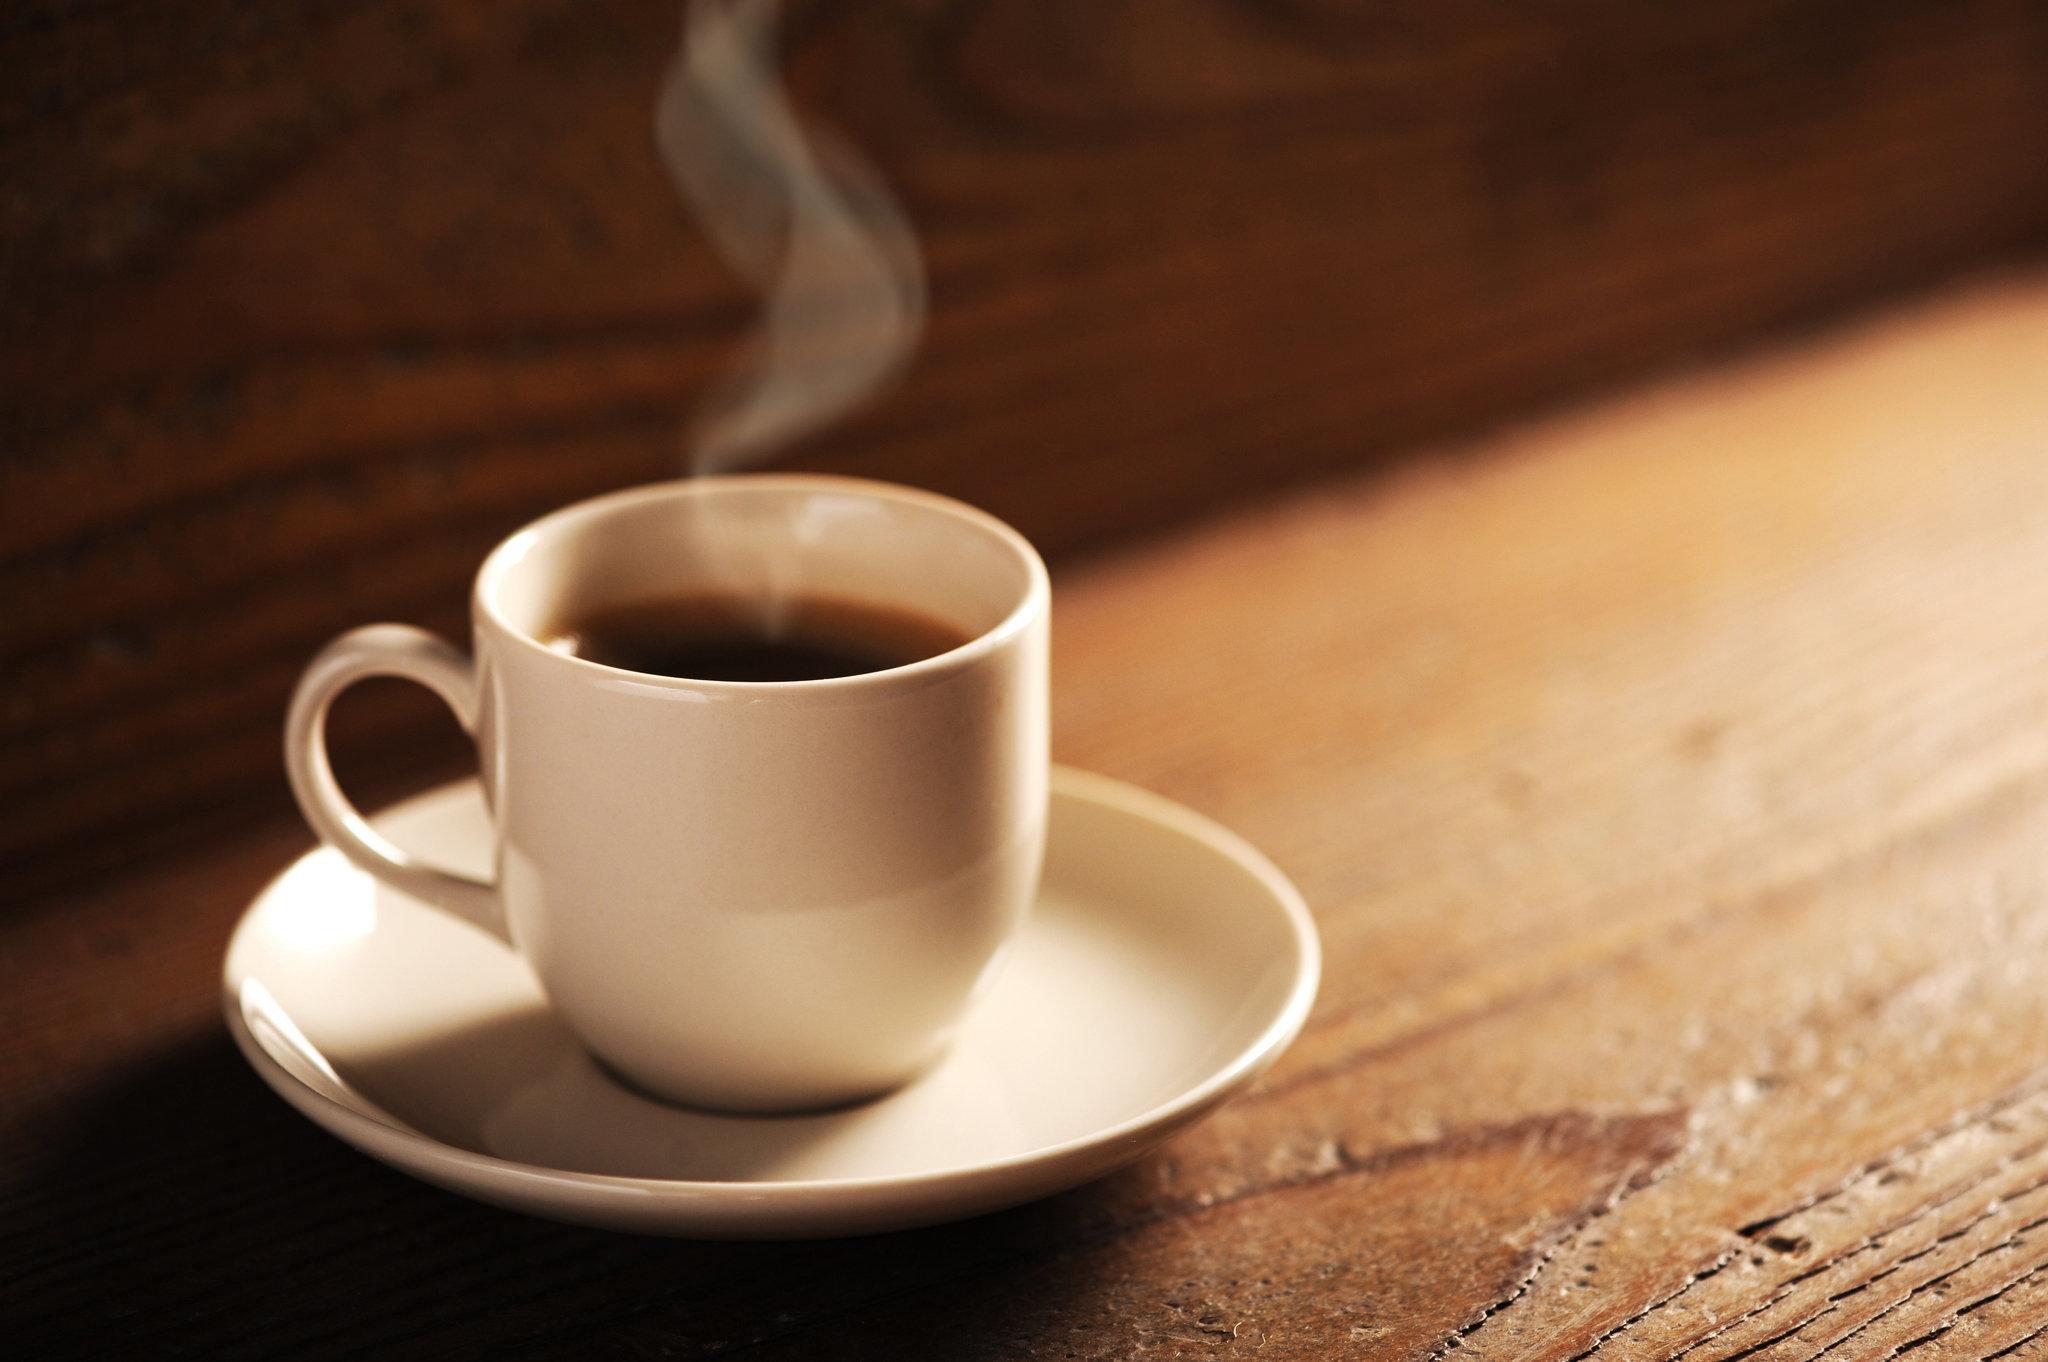 coffee-stock-photo-0e8b300f42157b6f.jpg